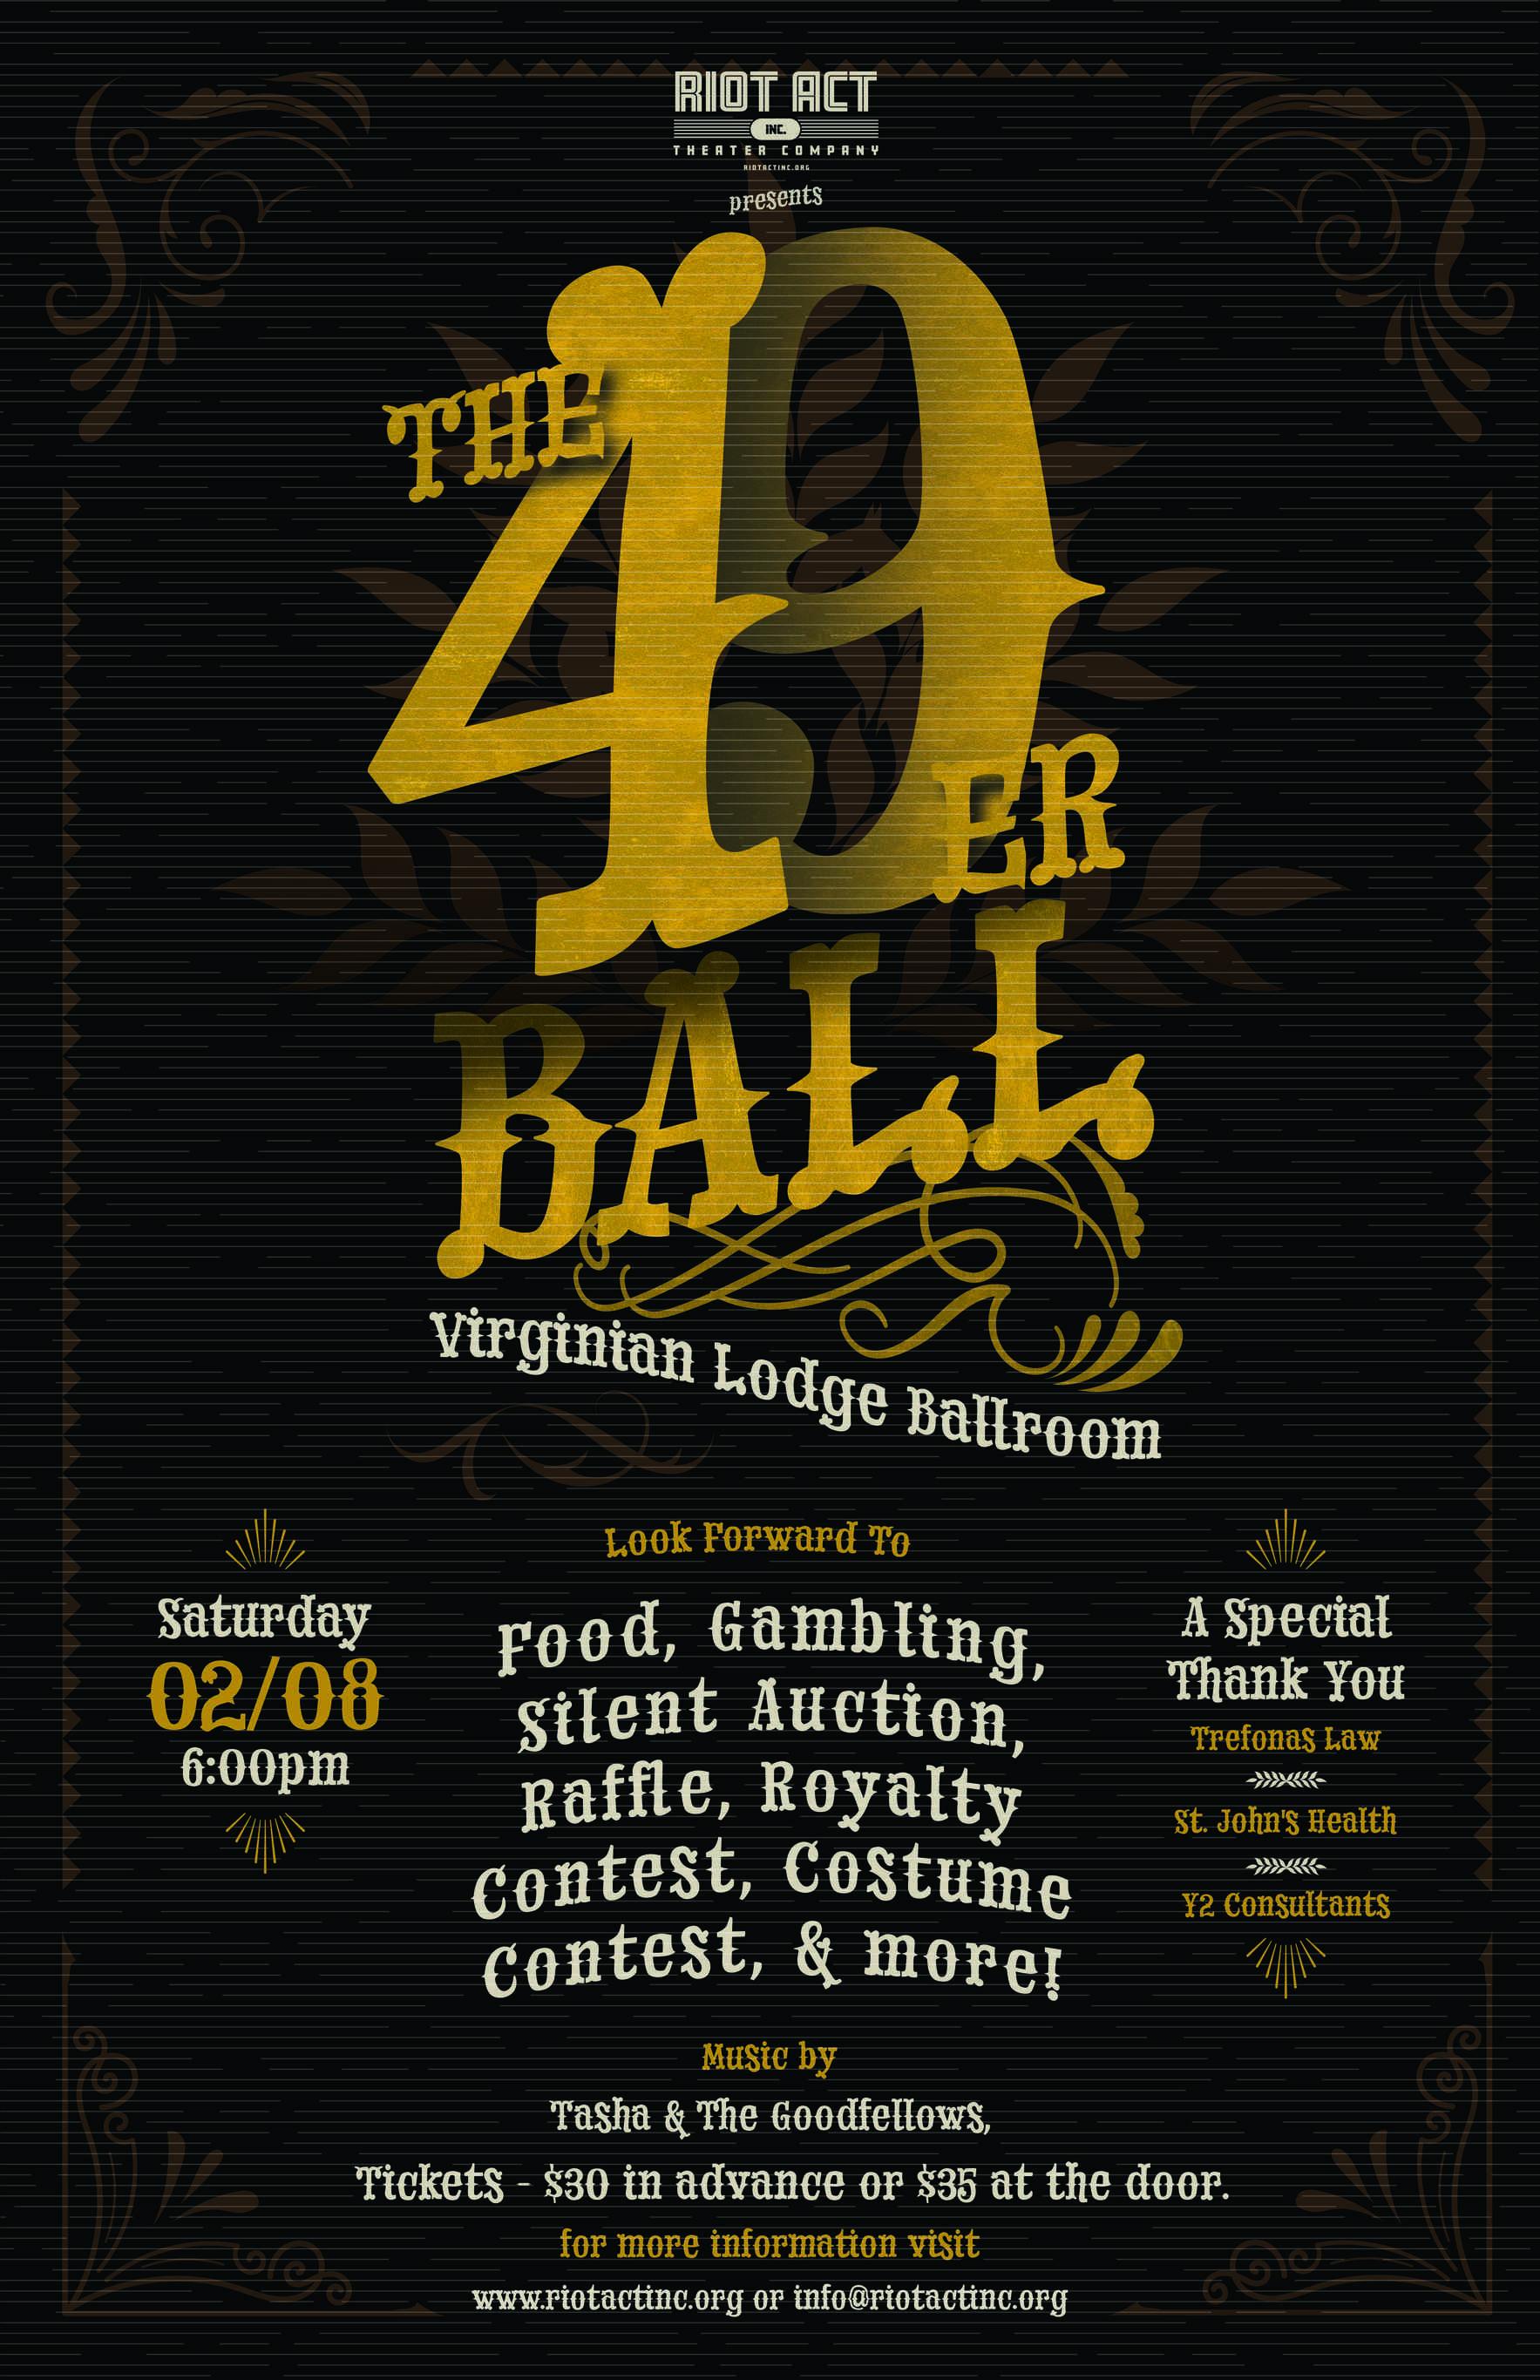 49er Ball image